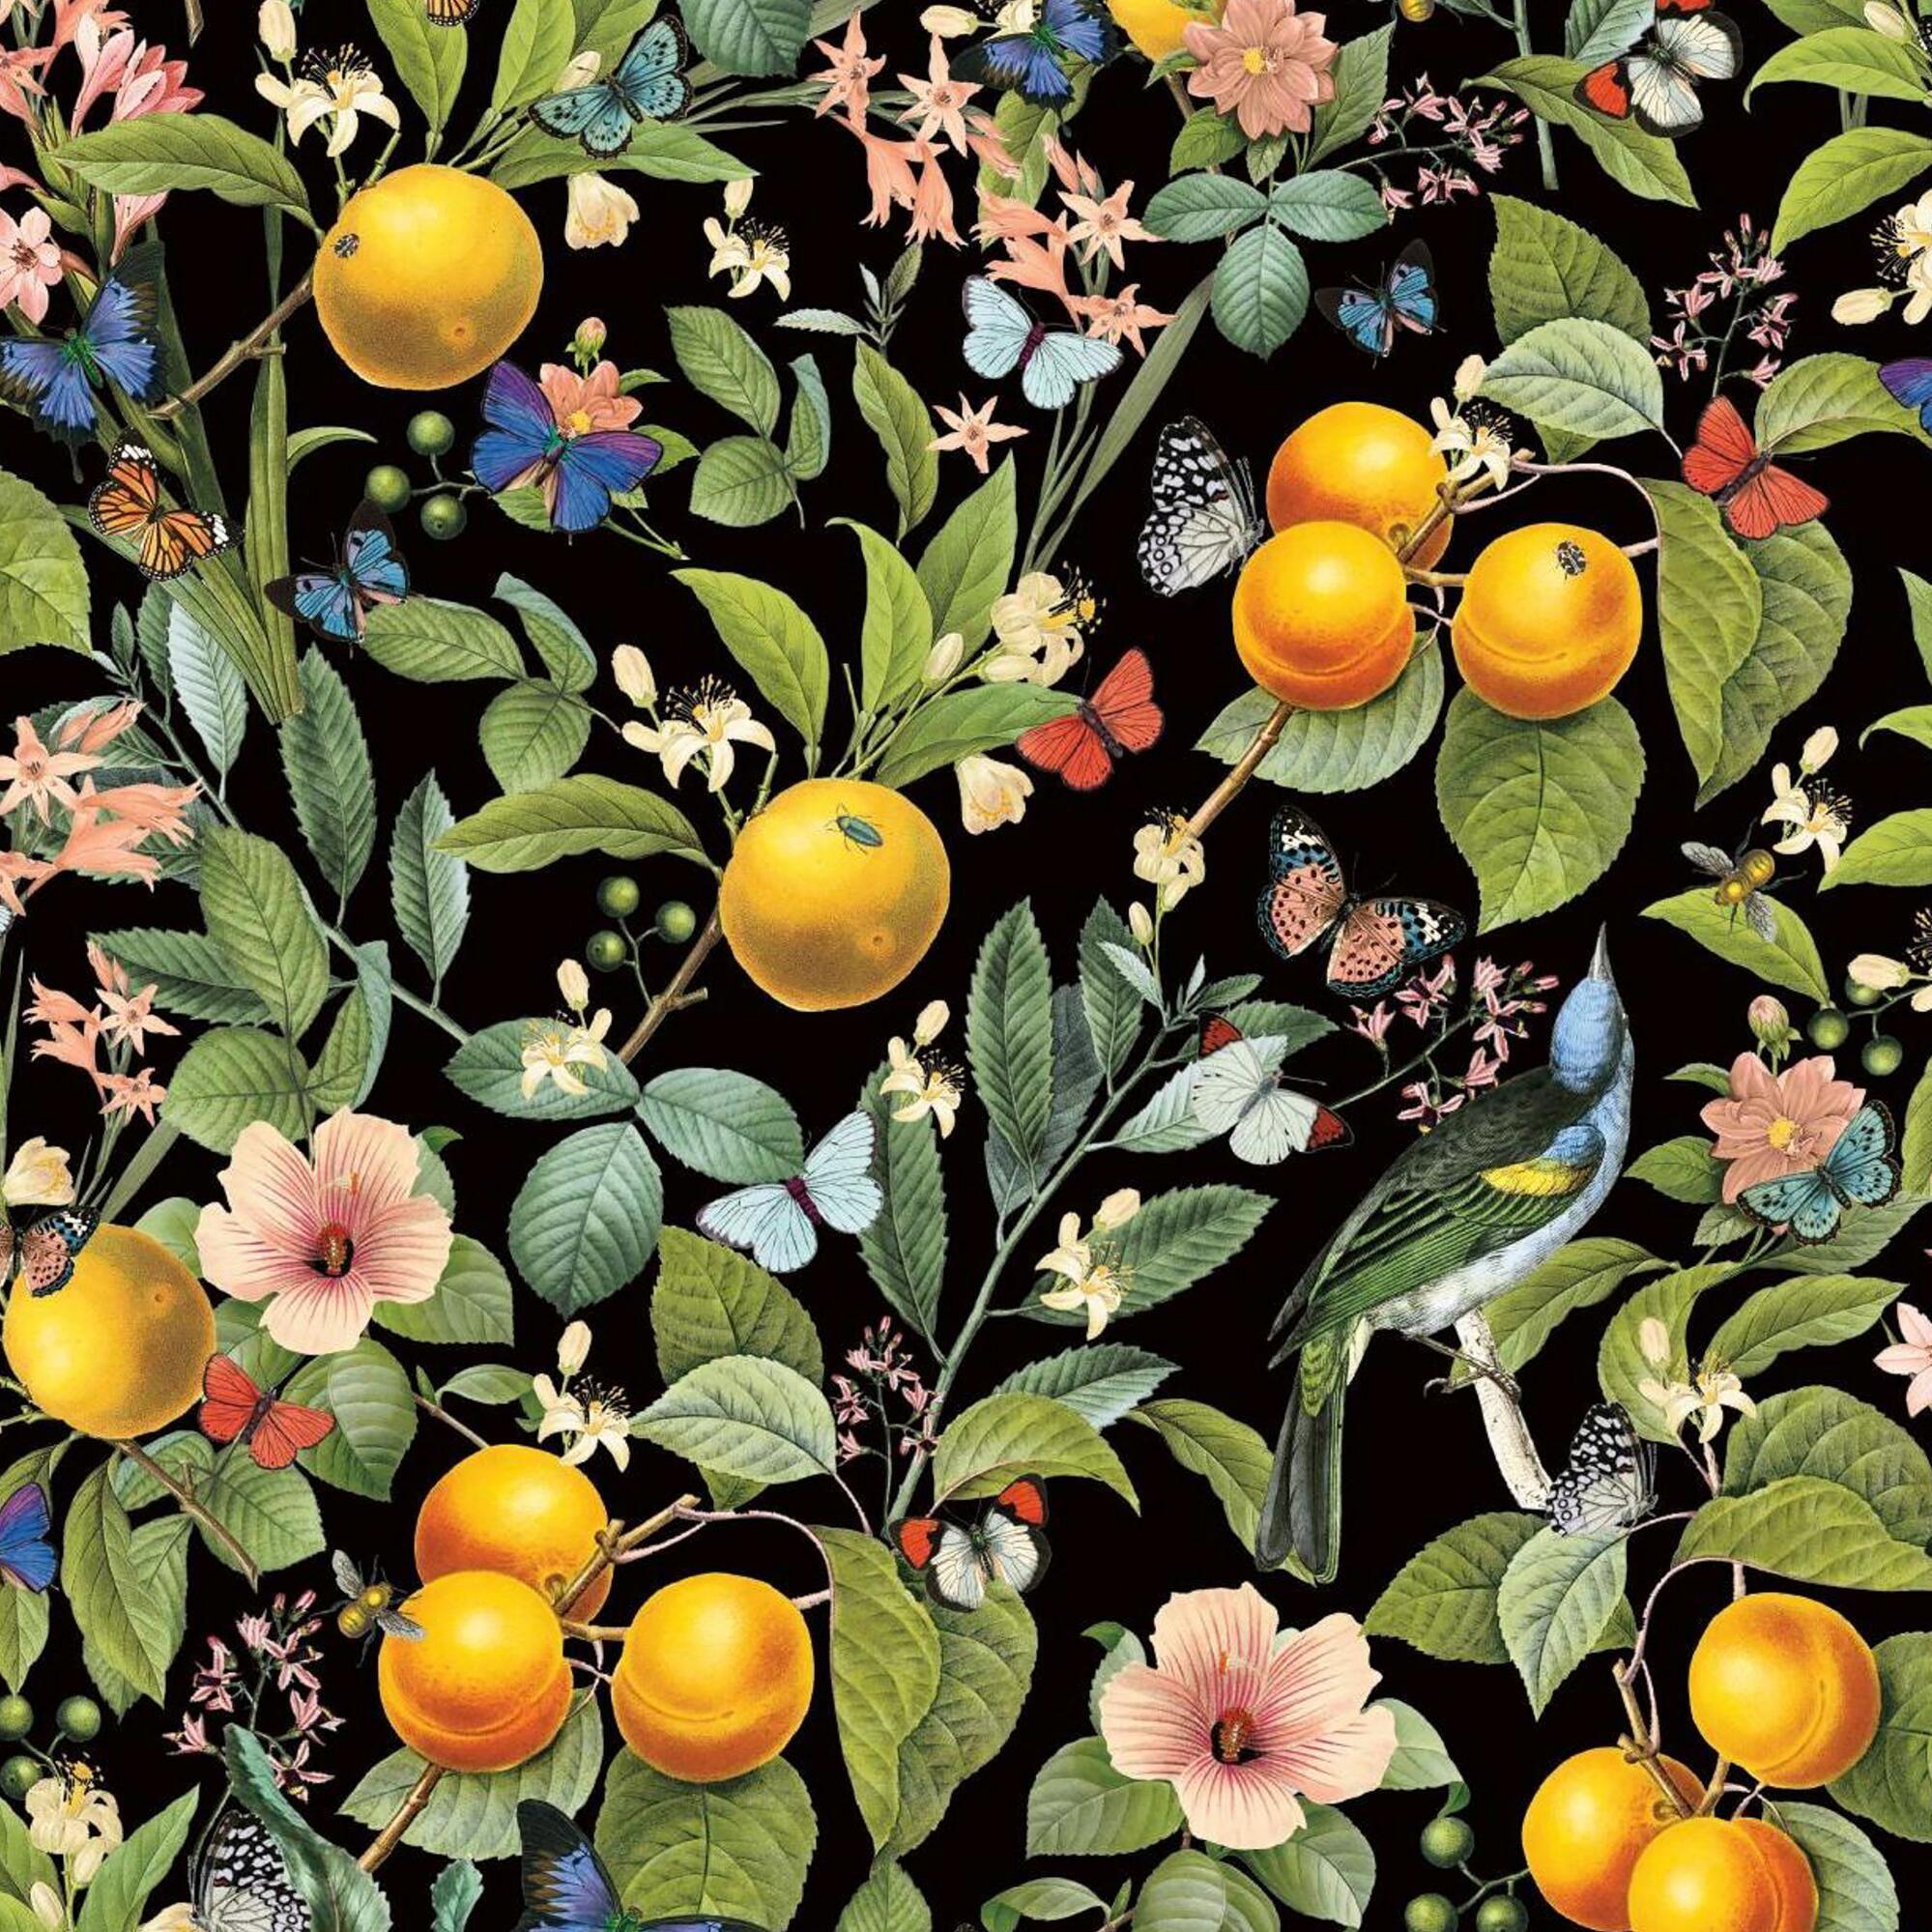 Citrus Garden Peel And Stick Wallpaper By World Market Peel And Stick Wallpaper Peelable Wallpaper Wallpaper Roll